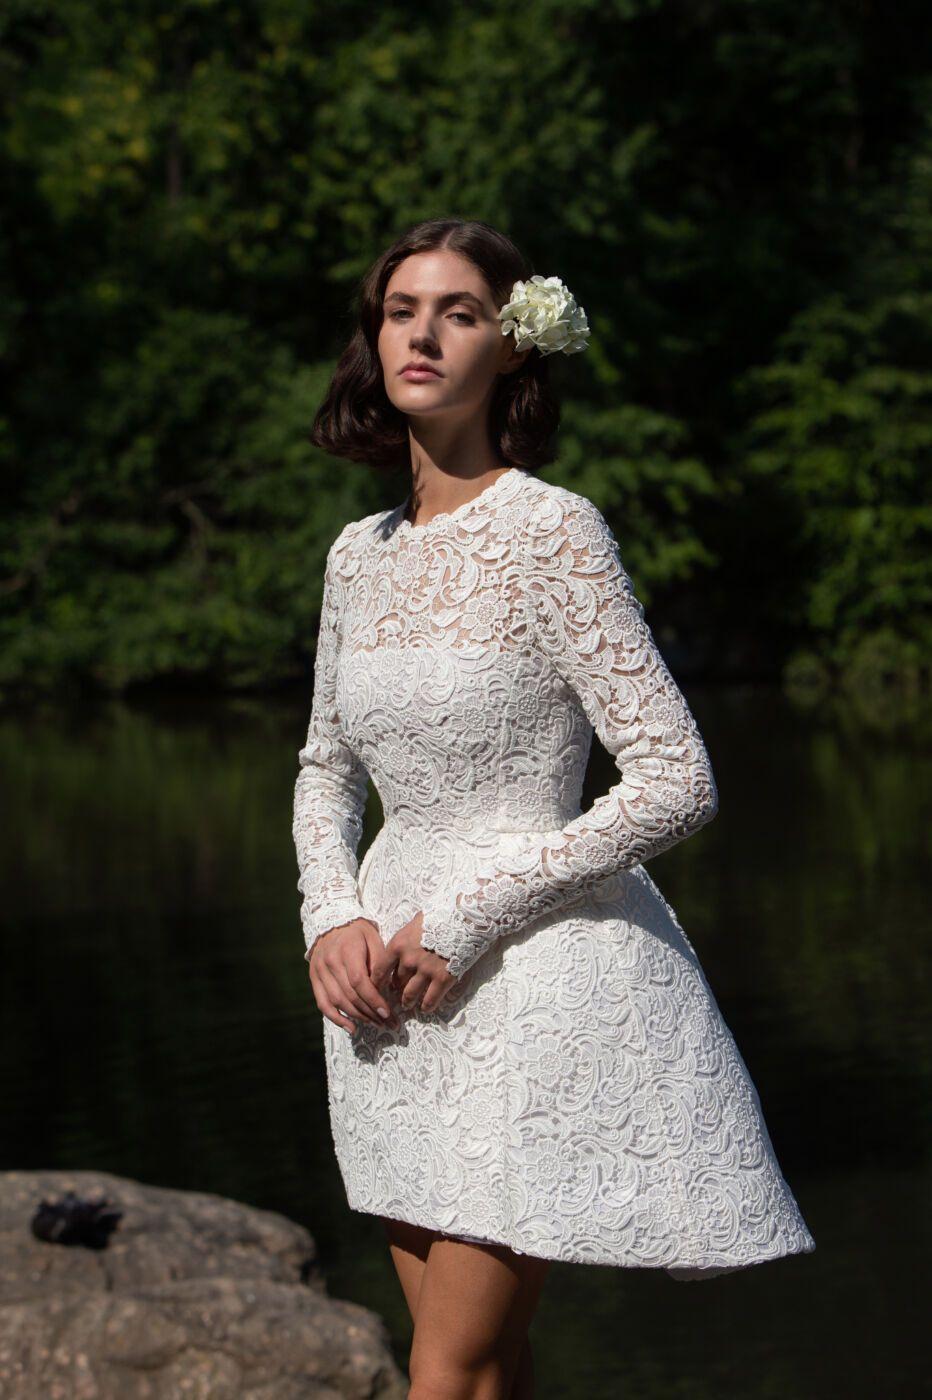 https://www.weddingmagazine.com.ua/wp-content/uploads/2021/09/giambattista-valli-bridal-2021-collection-5.jpeg